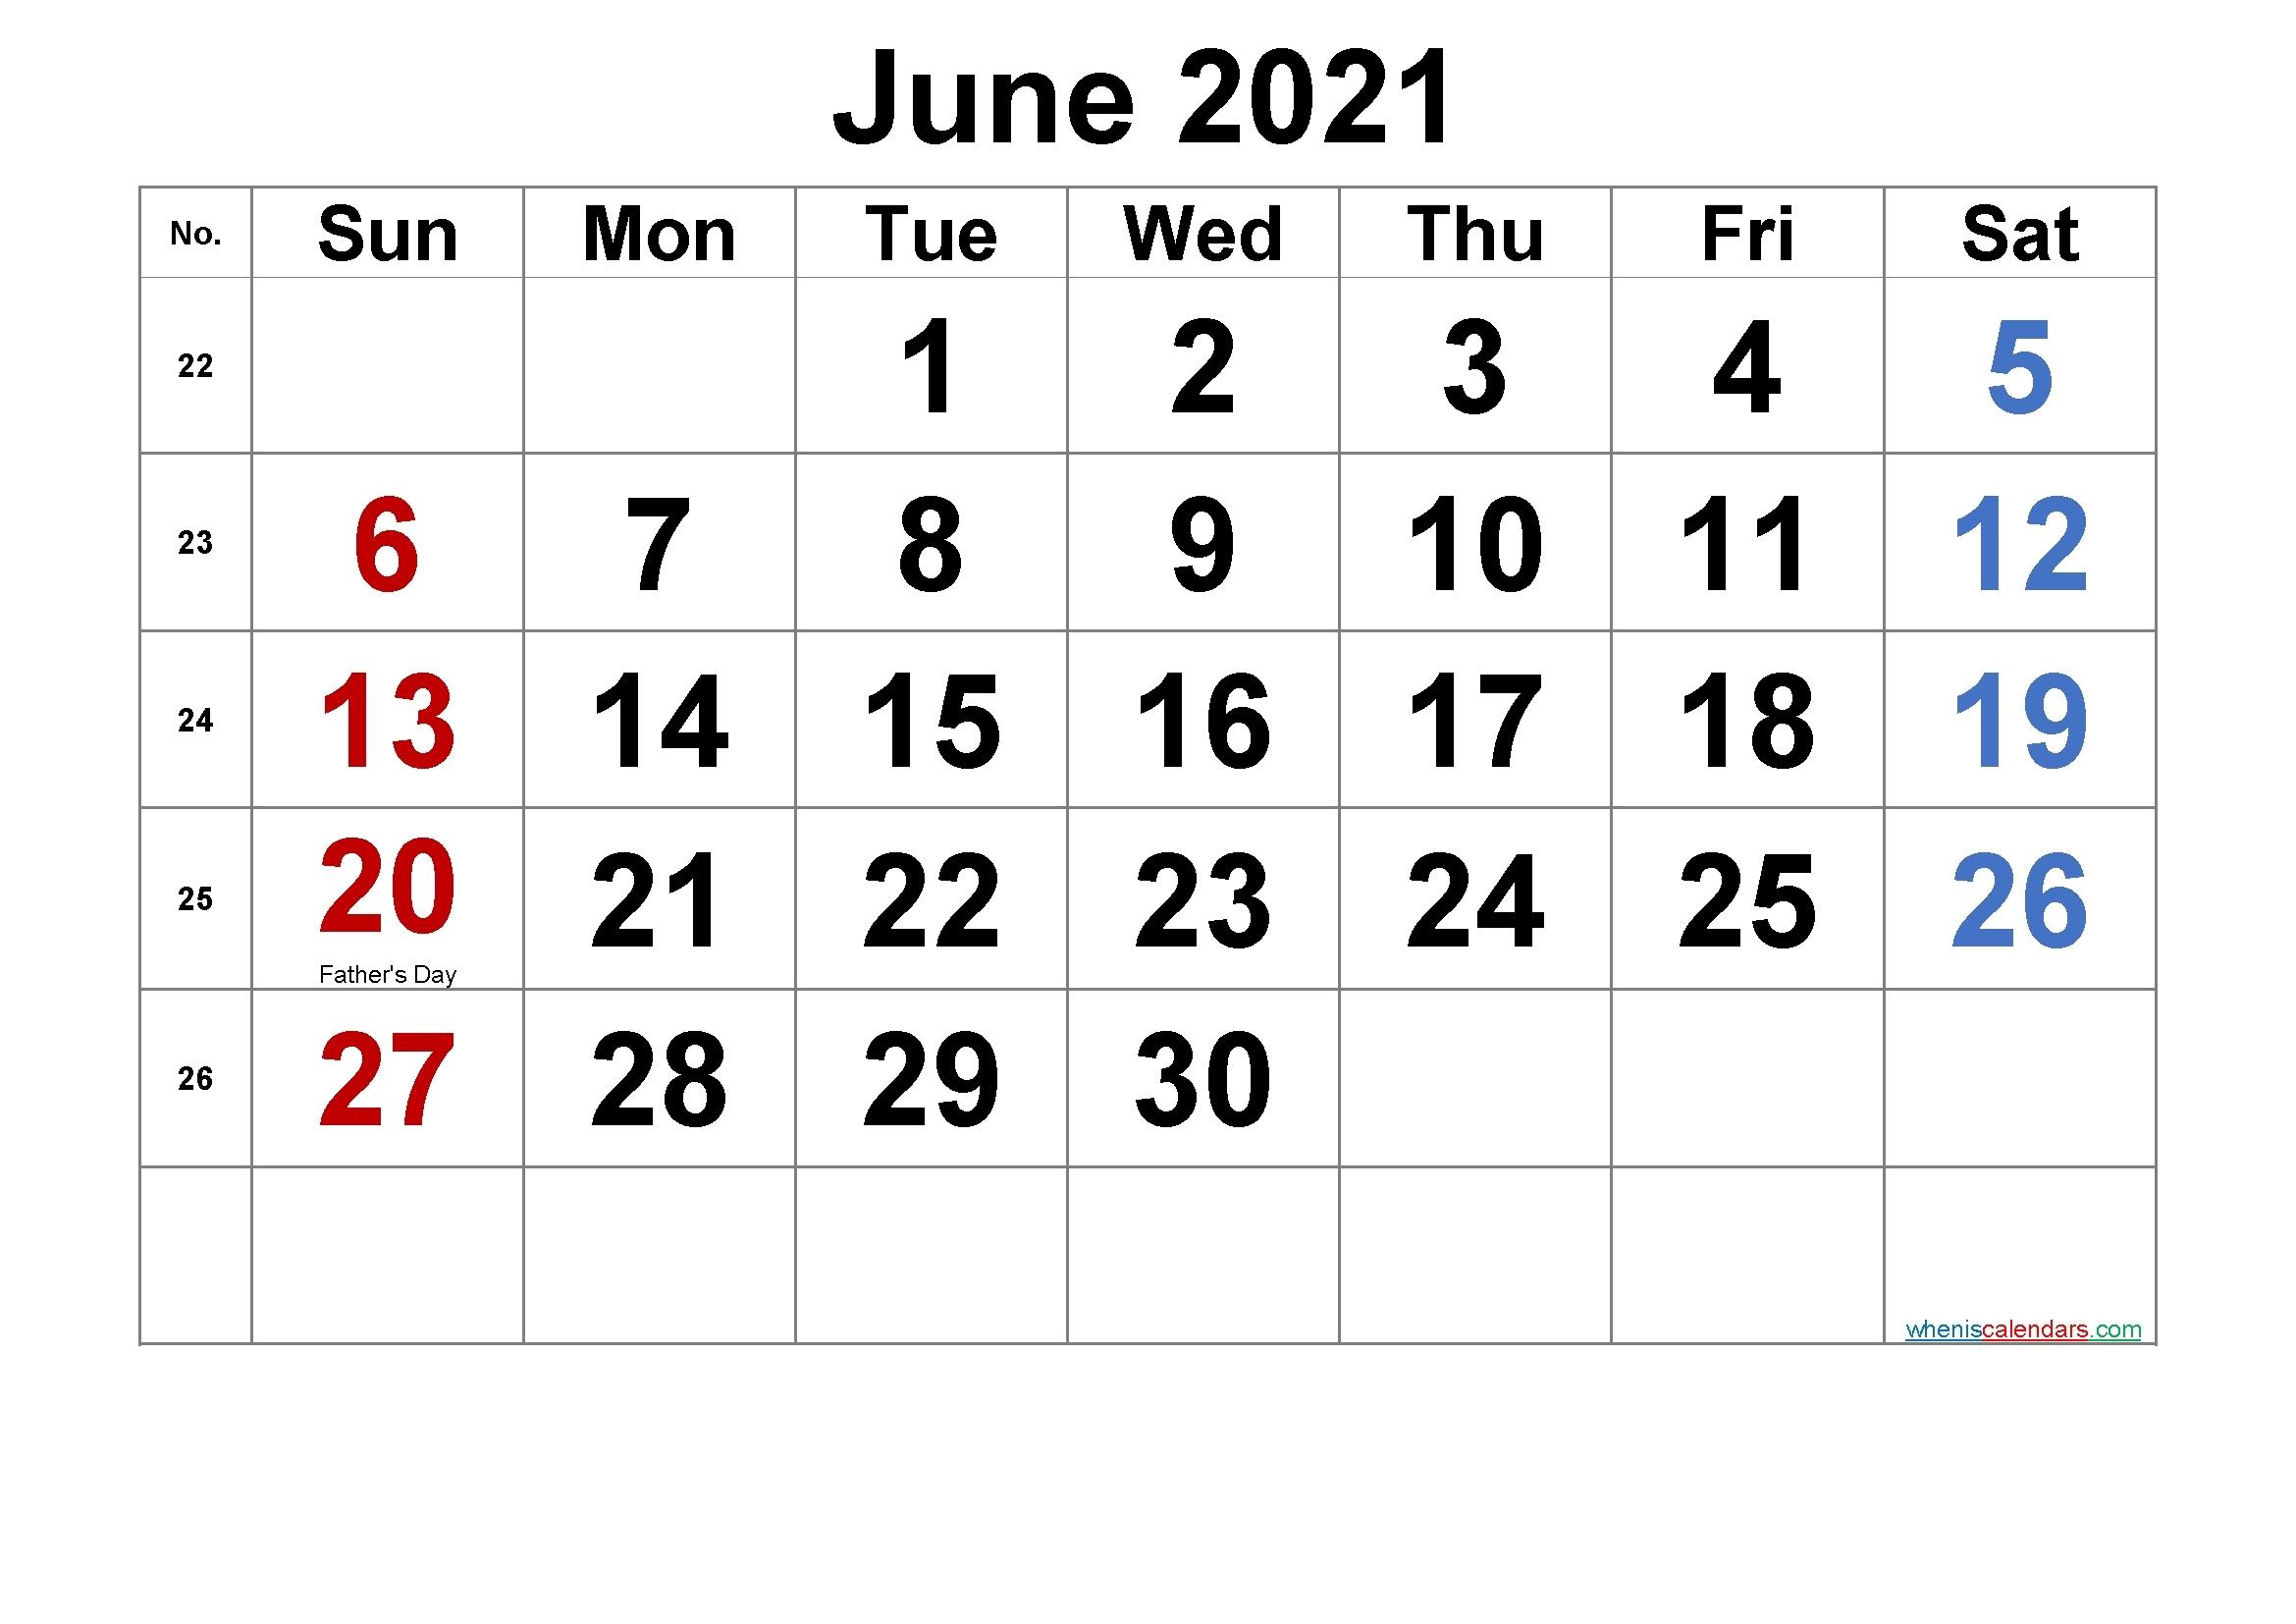 Nsw 2021 Calendar With Holidays Printable - Example